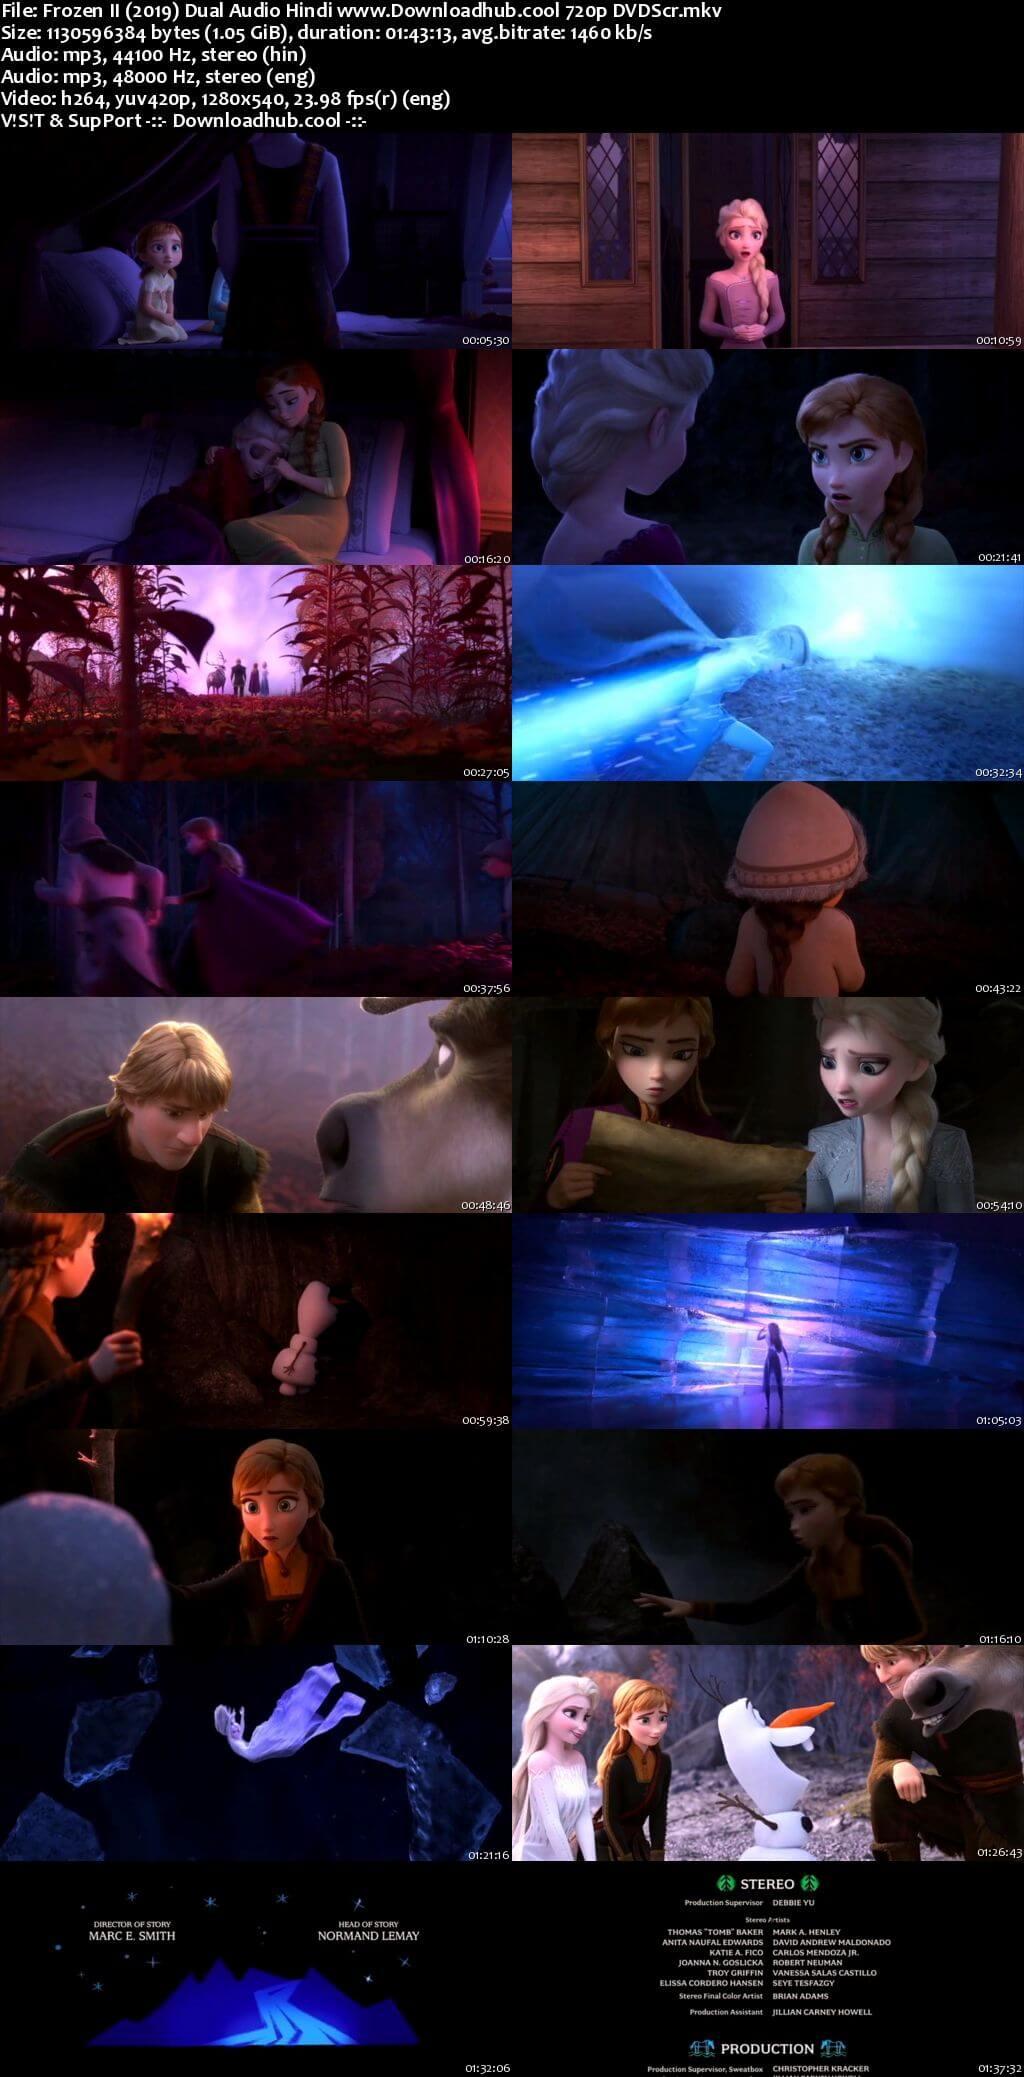 Frozen II 2019 Hindi Dual Audio 720p DVDScr x264